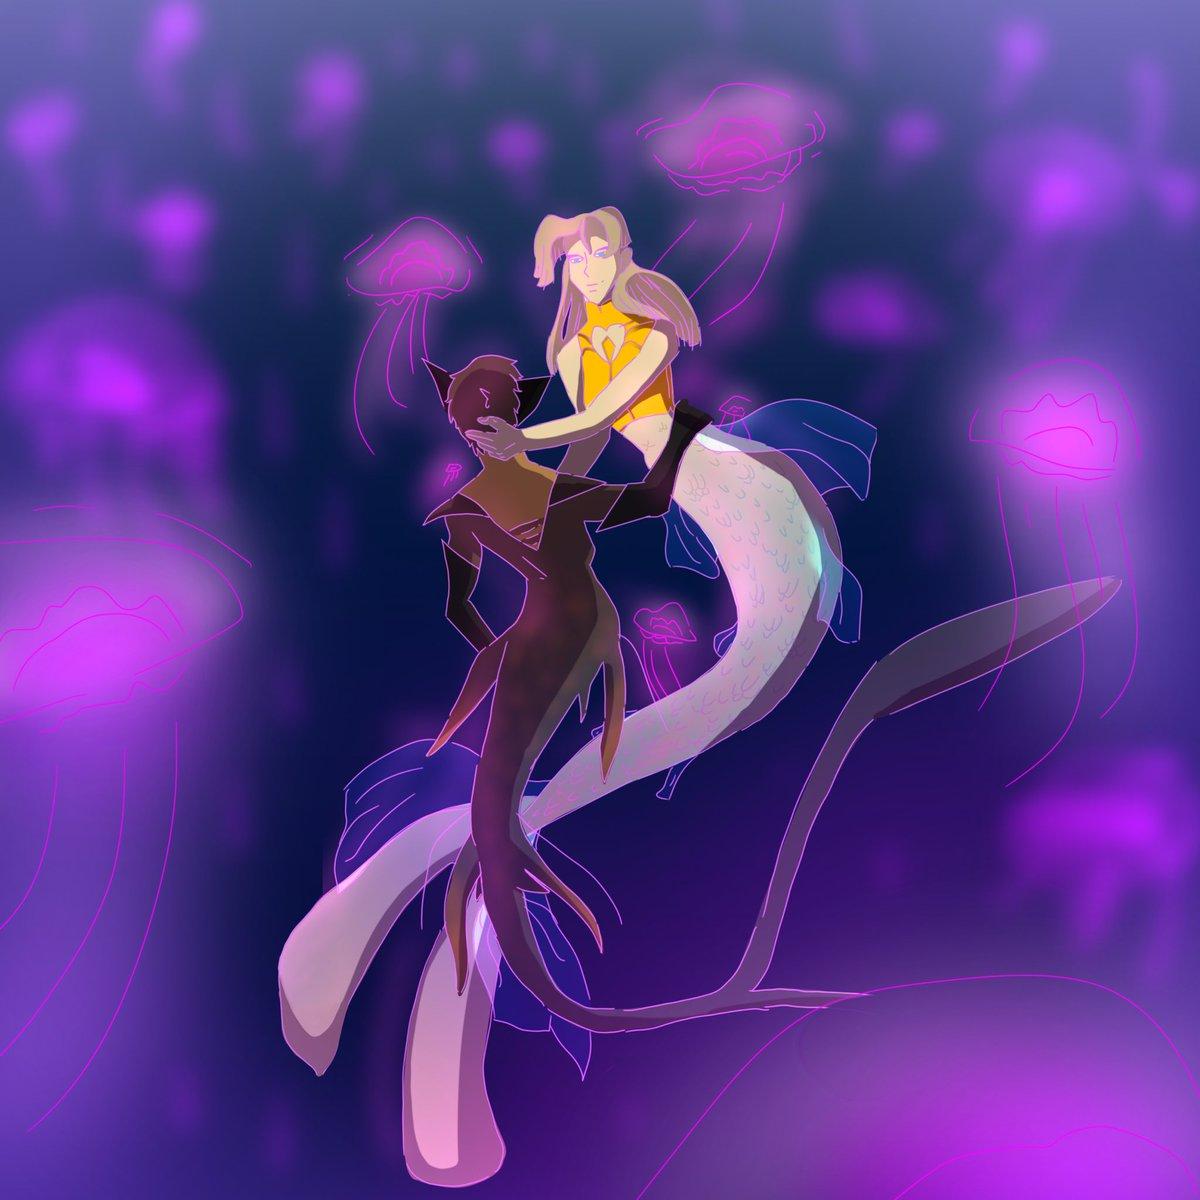 #catradora #mermaid #au  #shera #spop #쉬라 #SheARa #Mara #sheramara #marashera #spop #sheraandtheprincessesofpower #sheraprincessofpower #galaxy #greyskull  #草堂 #스케치 #sketch #sketching #sketchbook #드로잉 #creative #design #draw #drawing #画 #artist #artwork #art #otaku https://t.co/Jn6iSqncPj